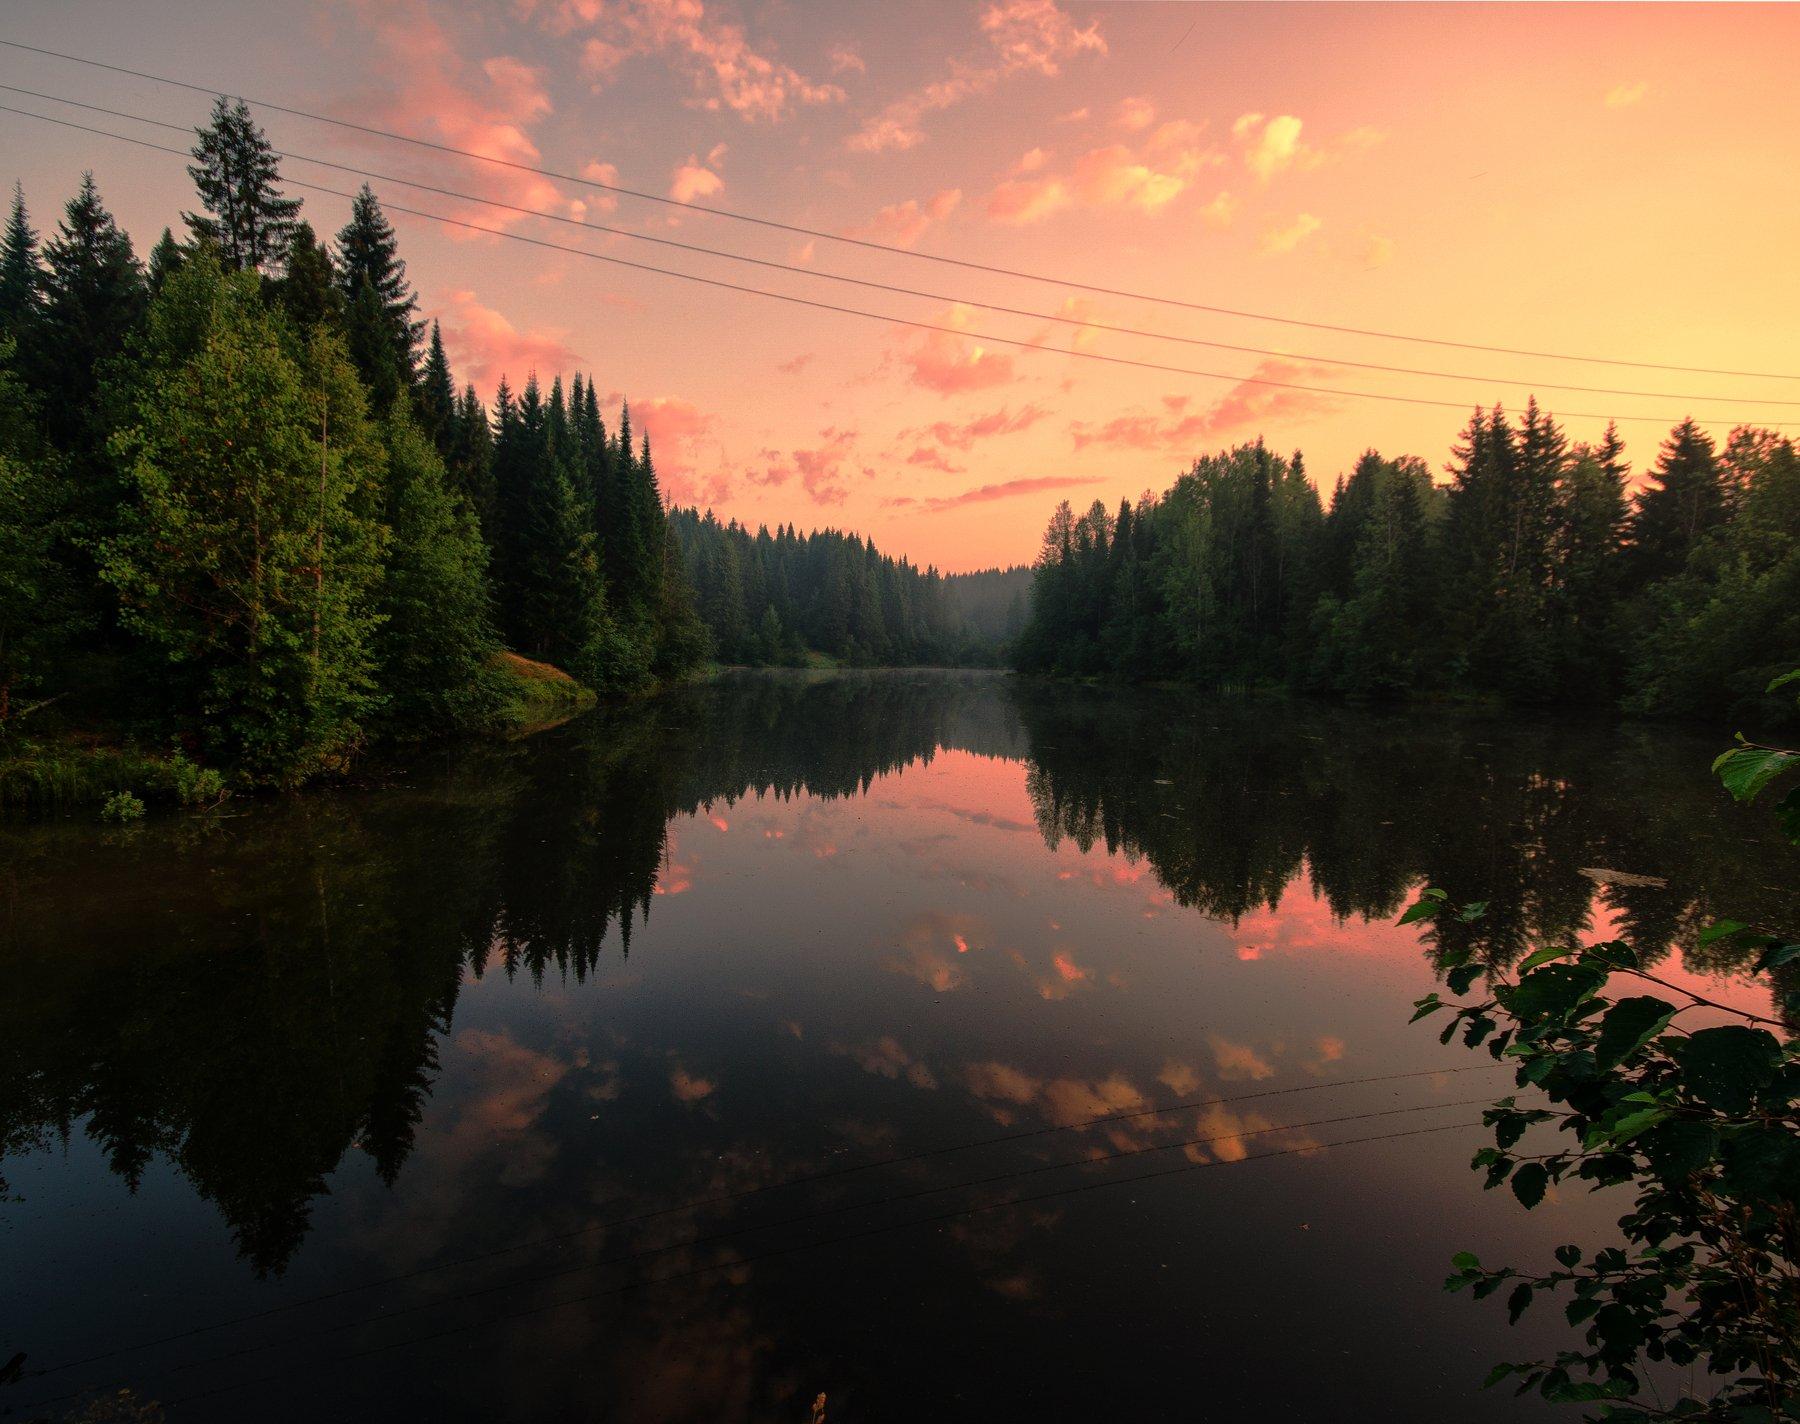 утро,провинция,солнце,природа, Карепанов Евгений